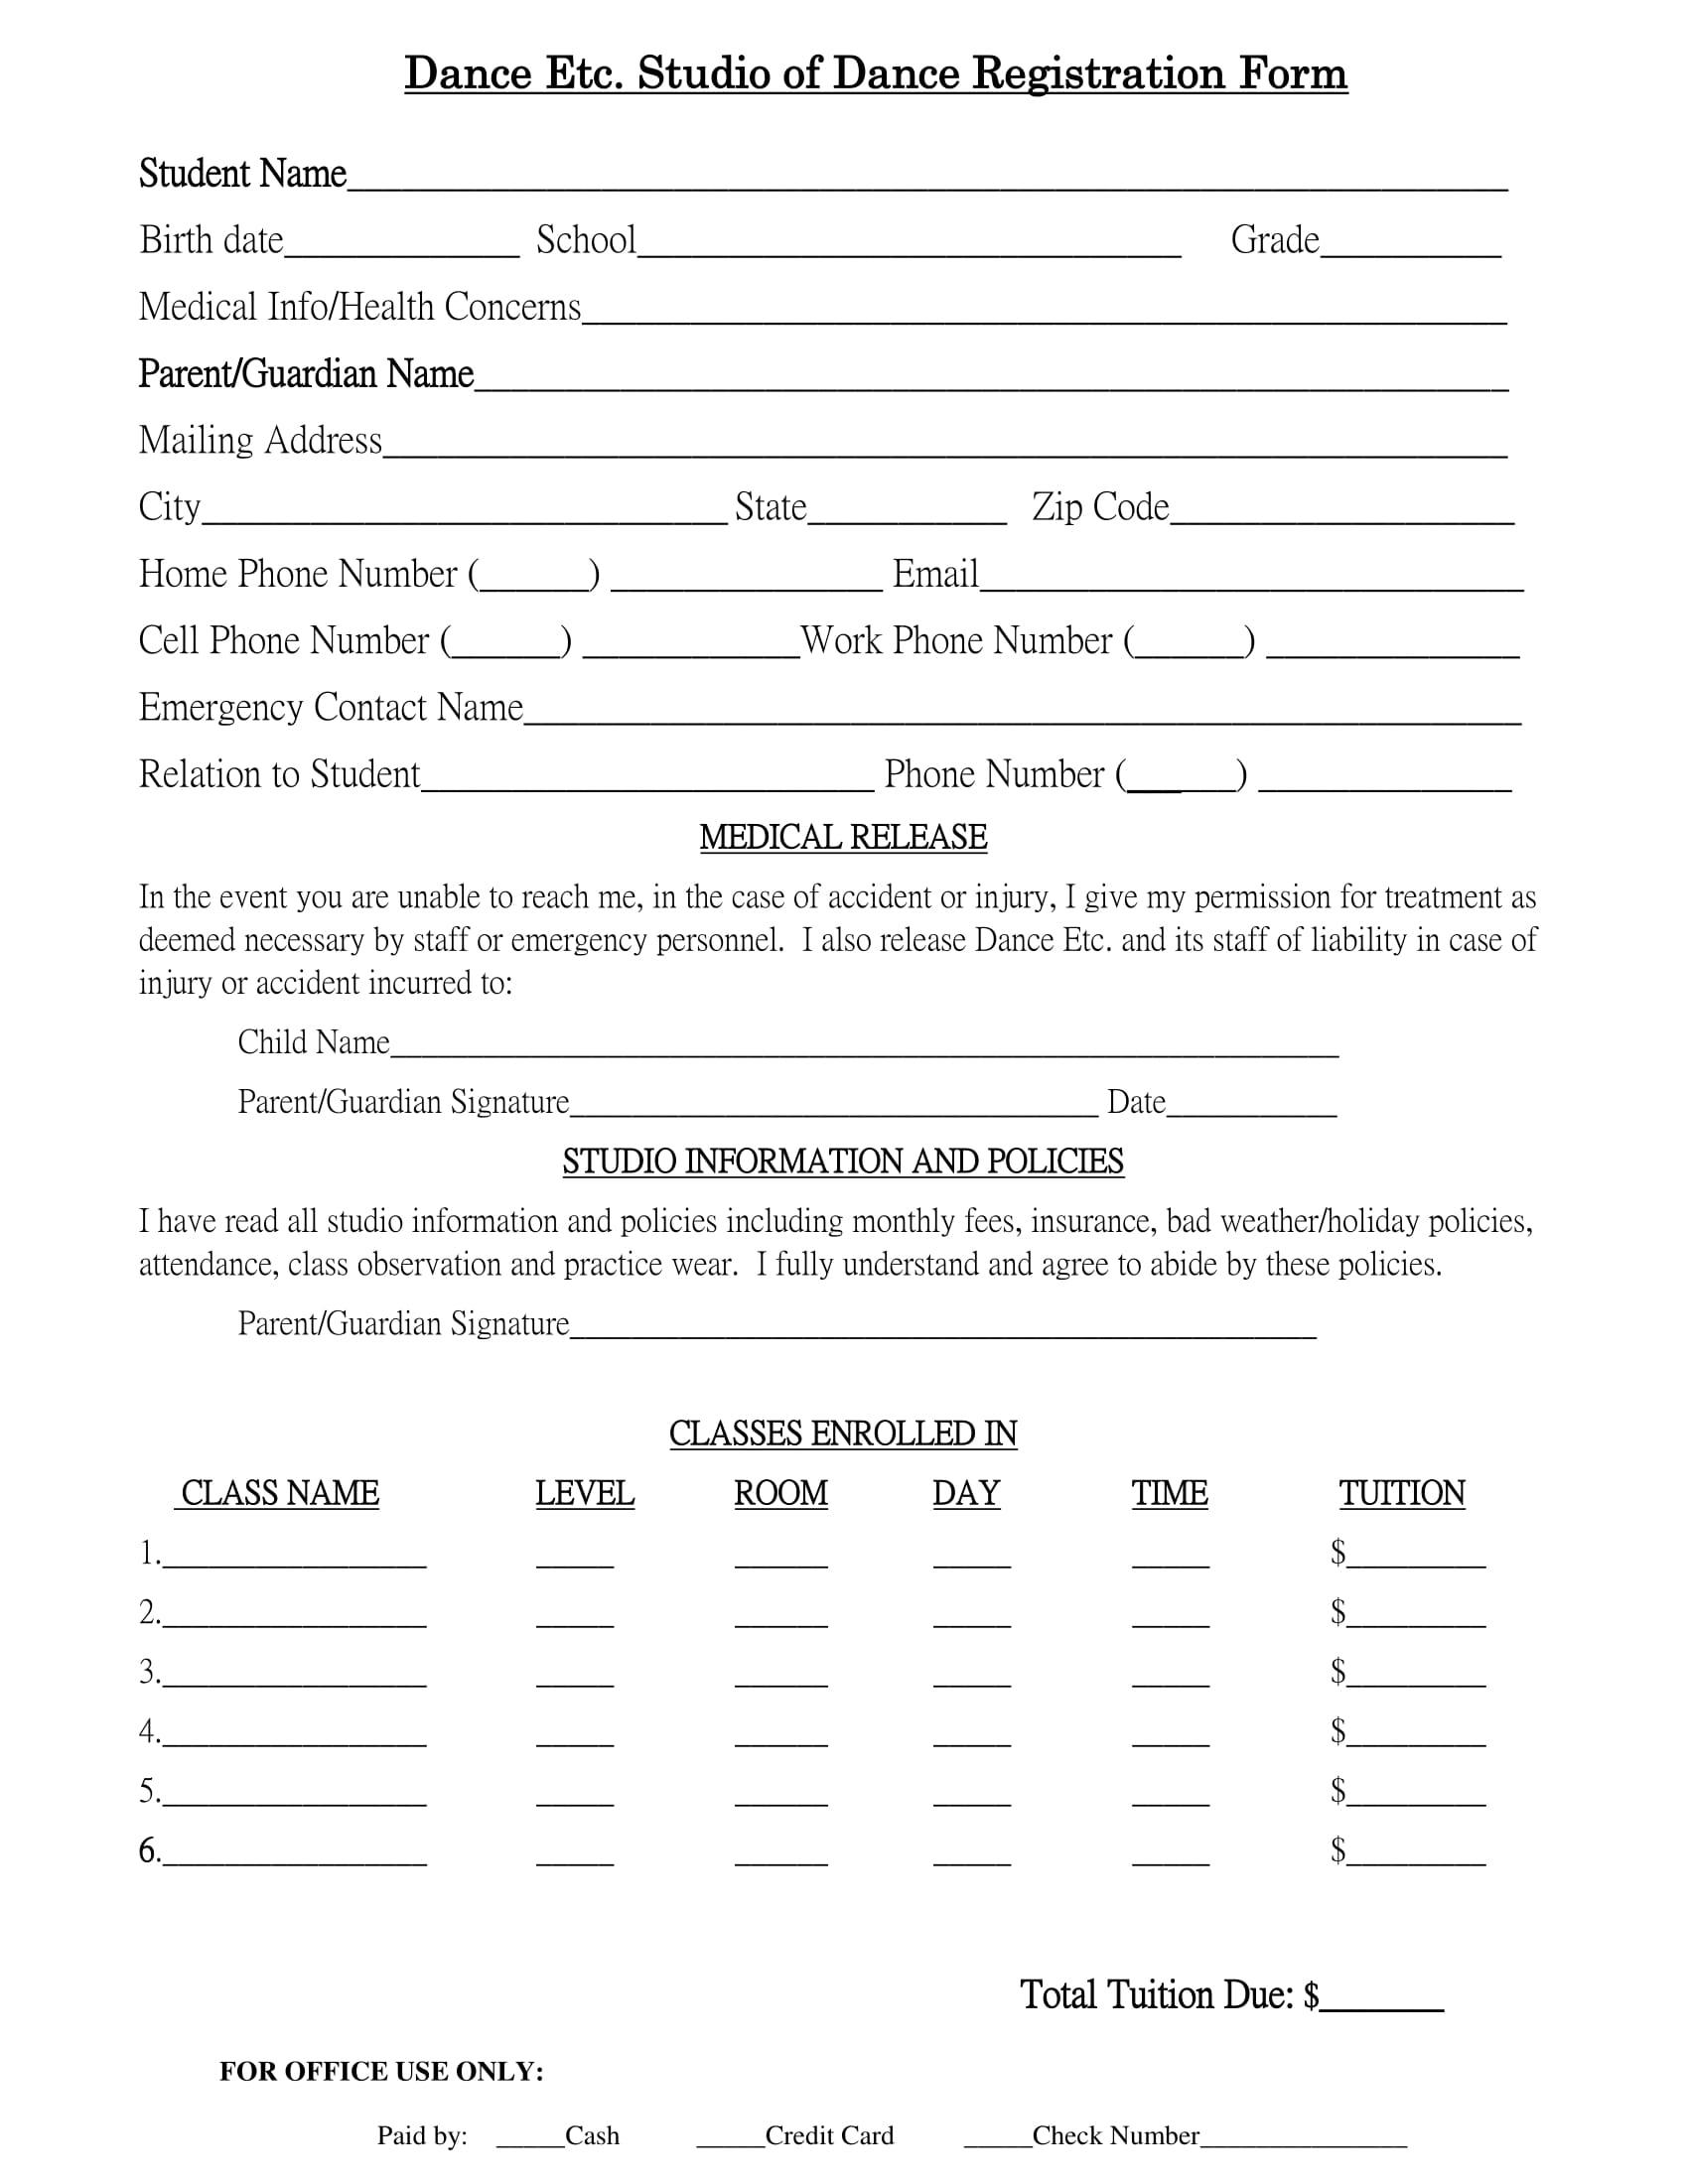 dance studio registration form 1